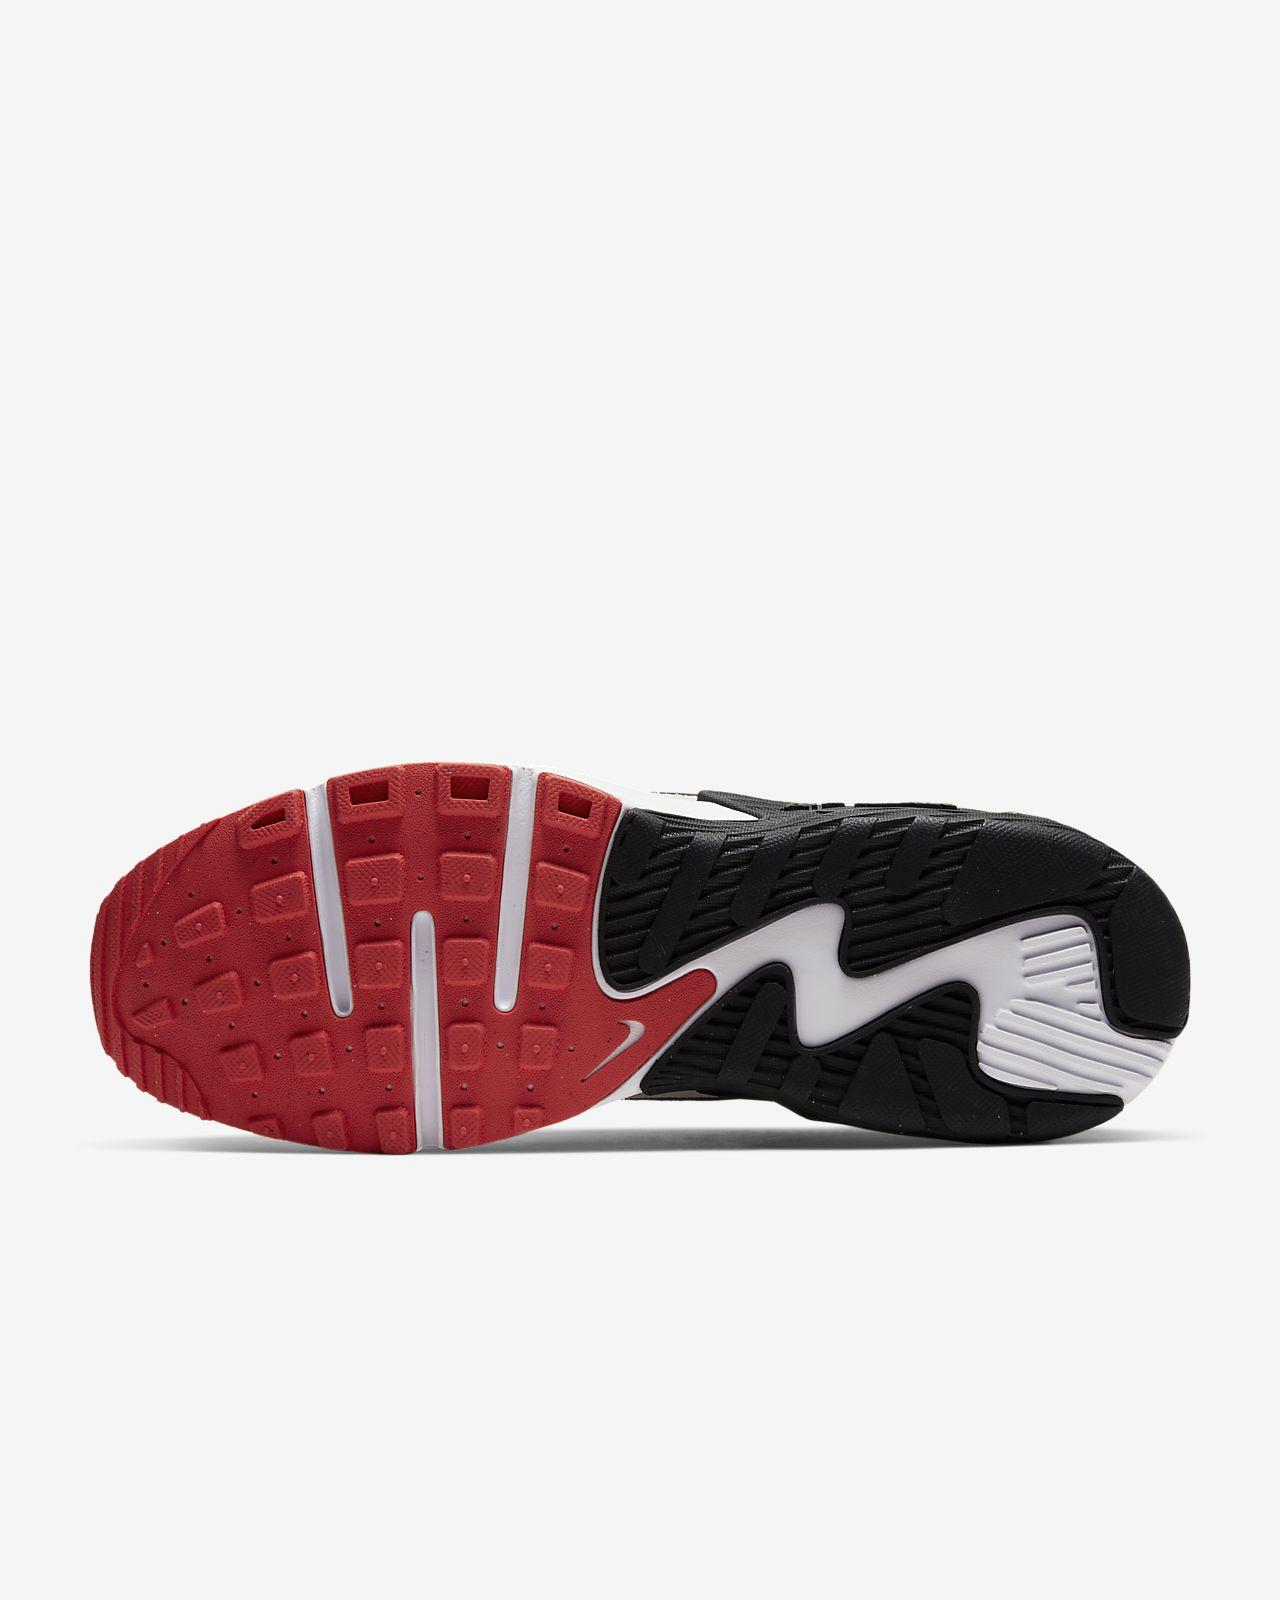 13 Classic Air Max 1 Sneakers in Honor of